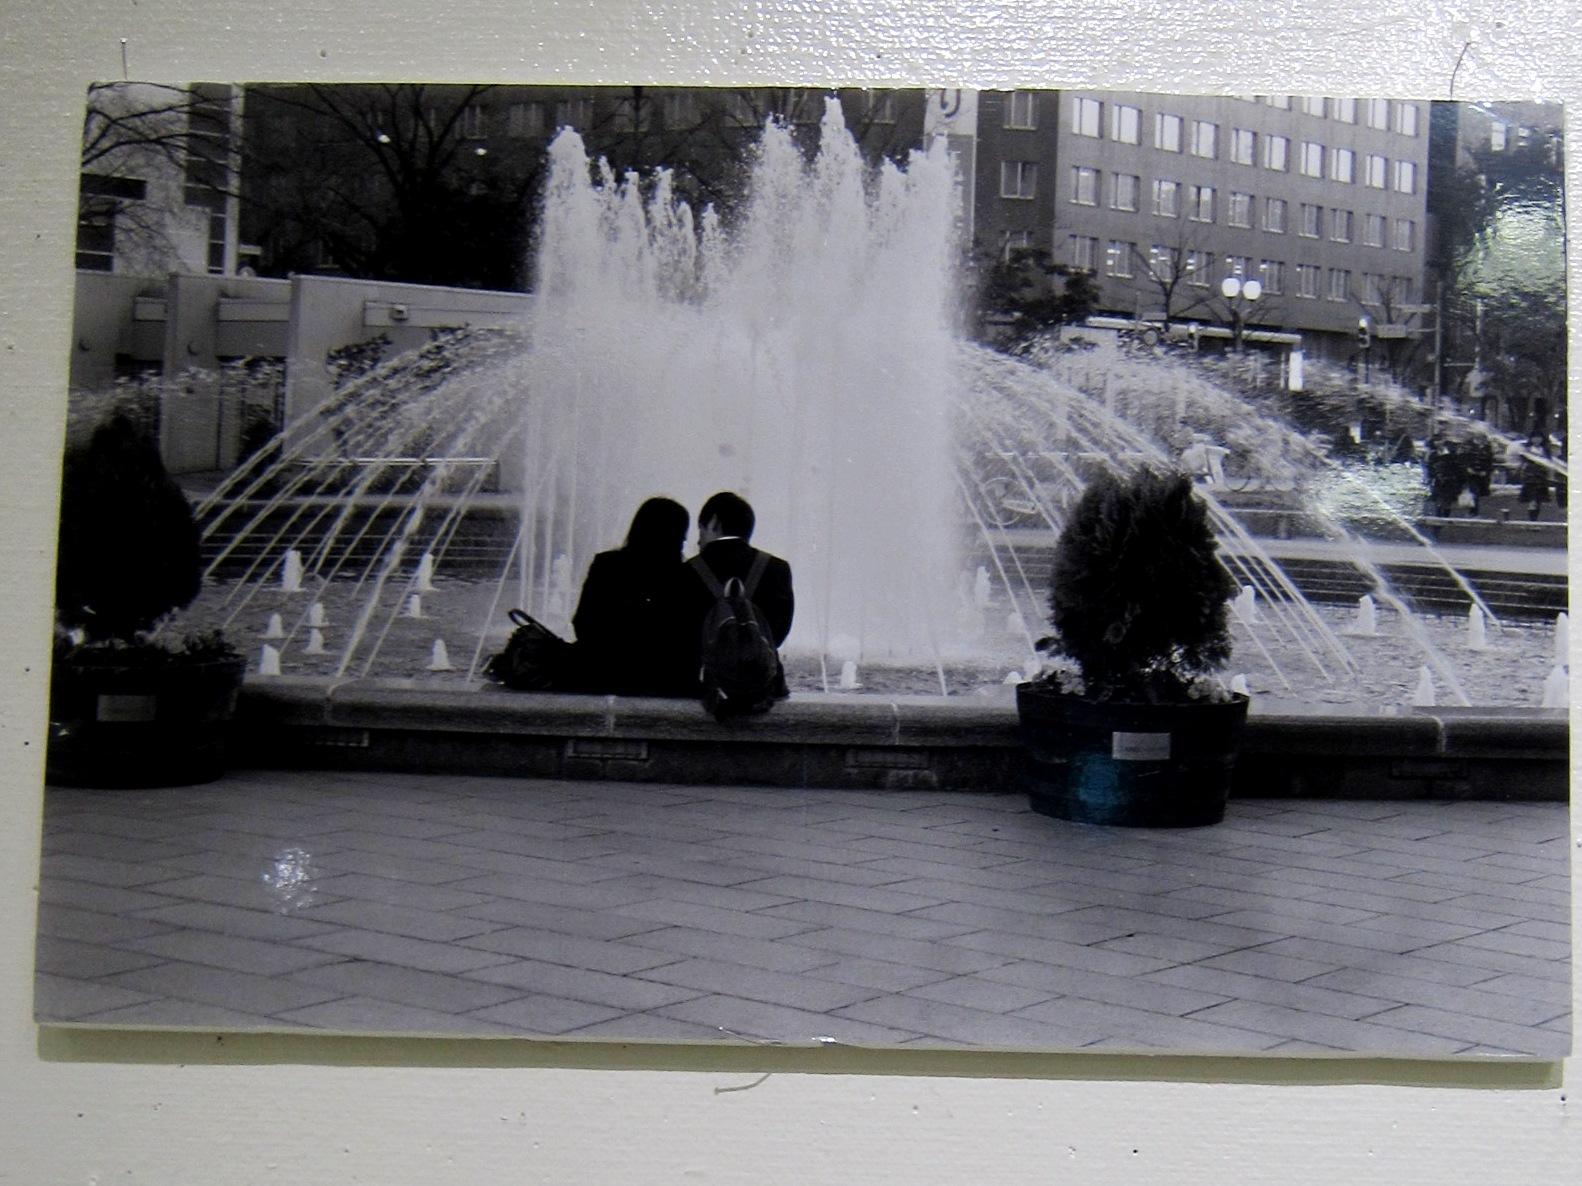 2375)「藤女子大学写真部写真展 三月展」 アイボリー 終了/3月11日(火)~3月16日(日)   _f0126829_21534290.jpg